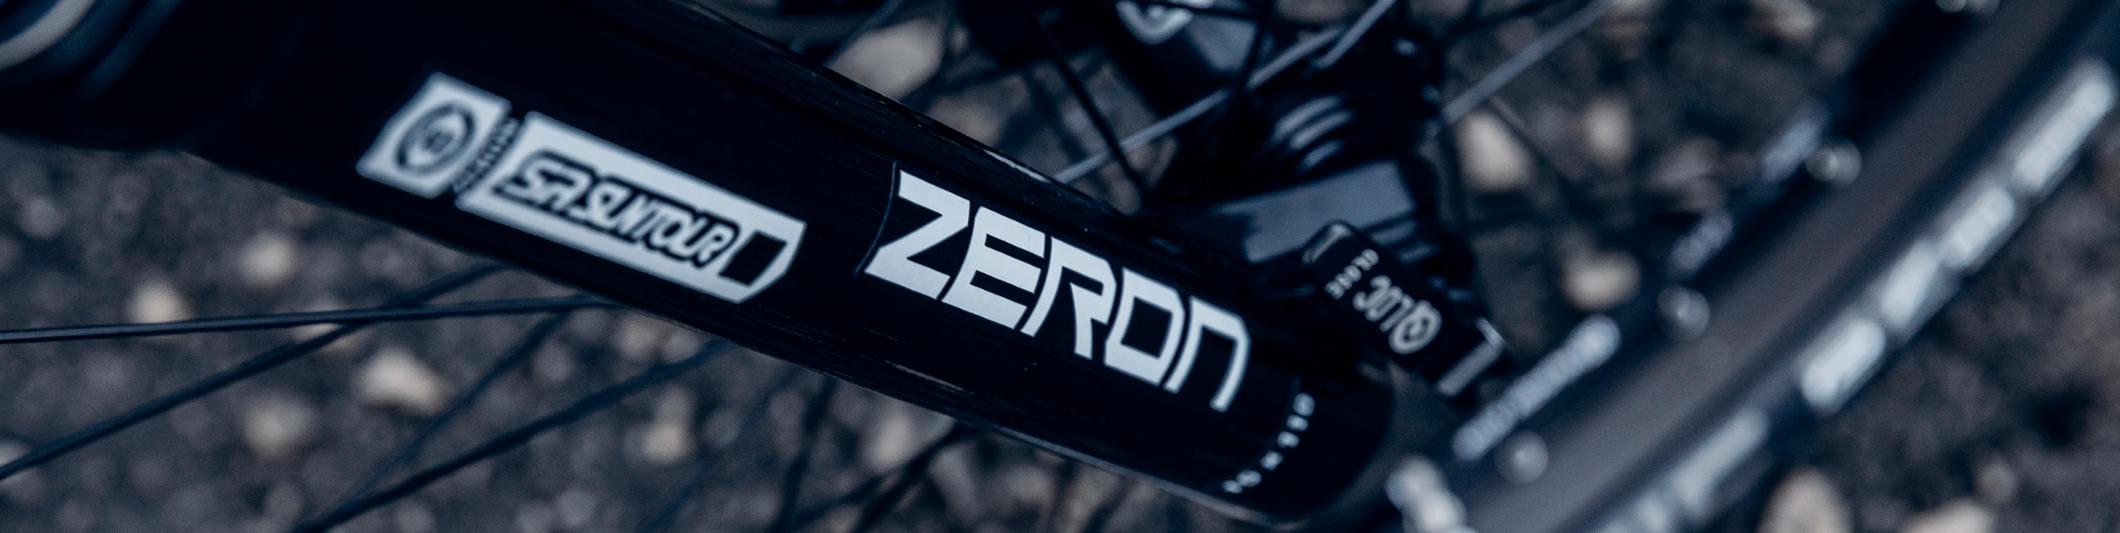 Hertrampf E-Bikes - Über uns